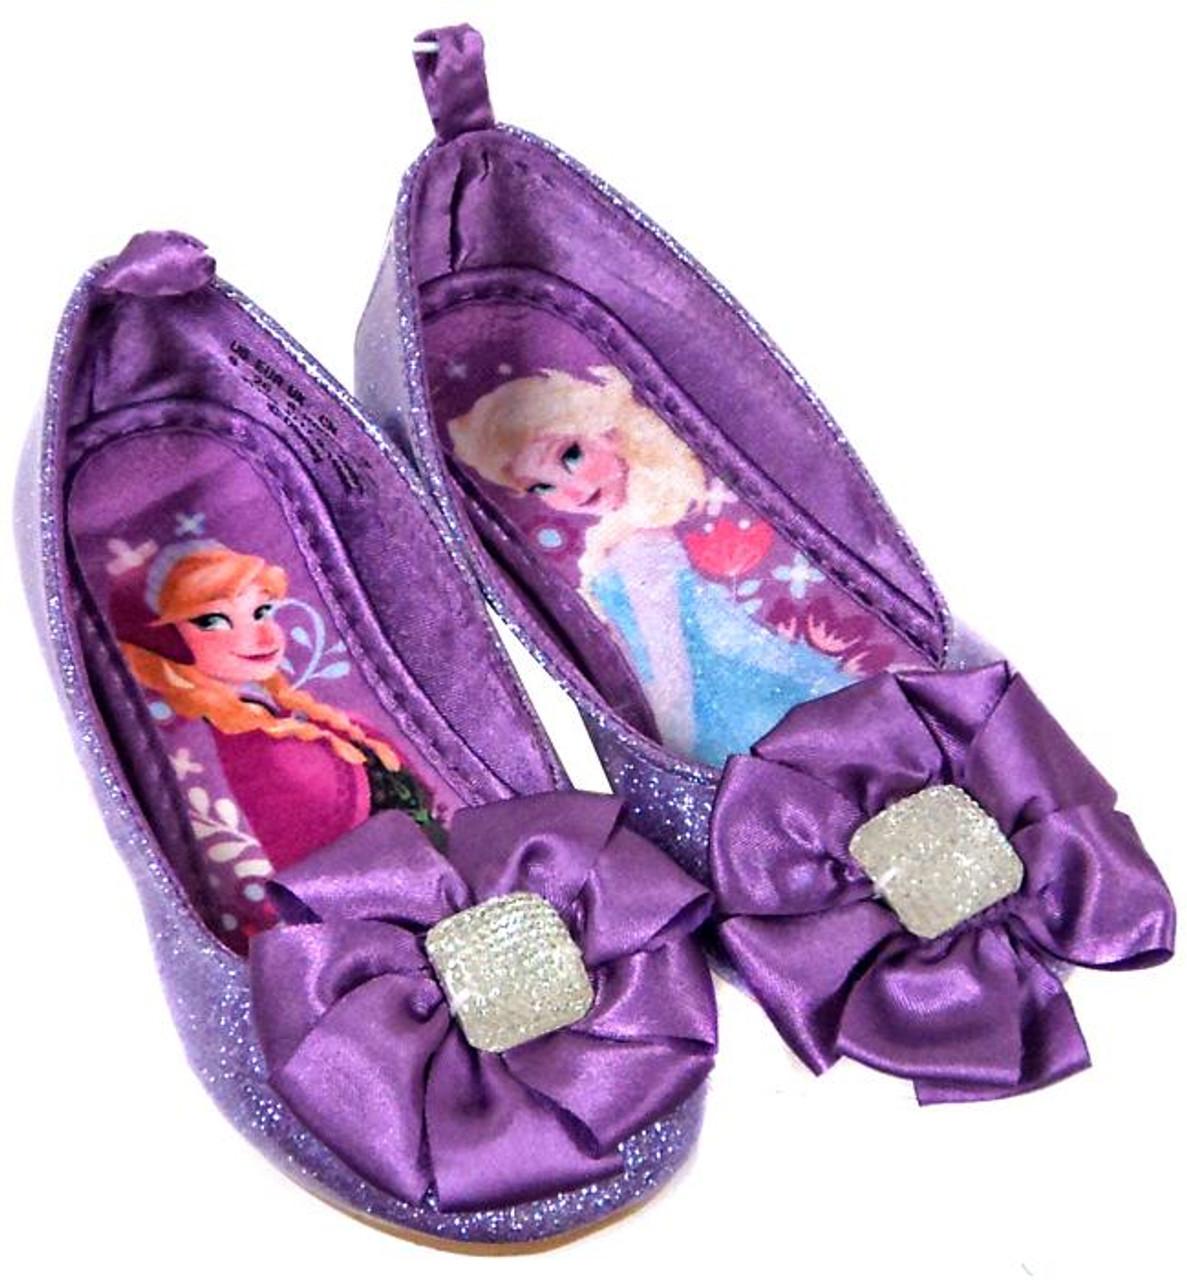 Disney Frozen Purple Anna & Elsa Exclusive Dress Up Toy [Size 8]